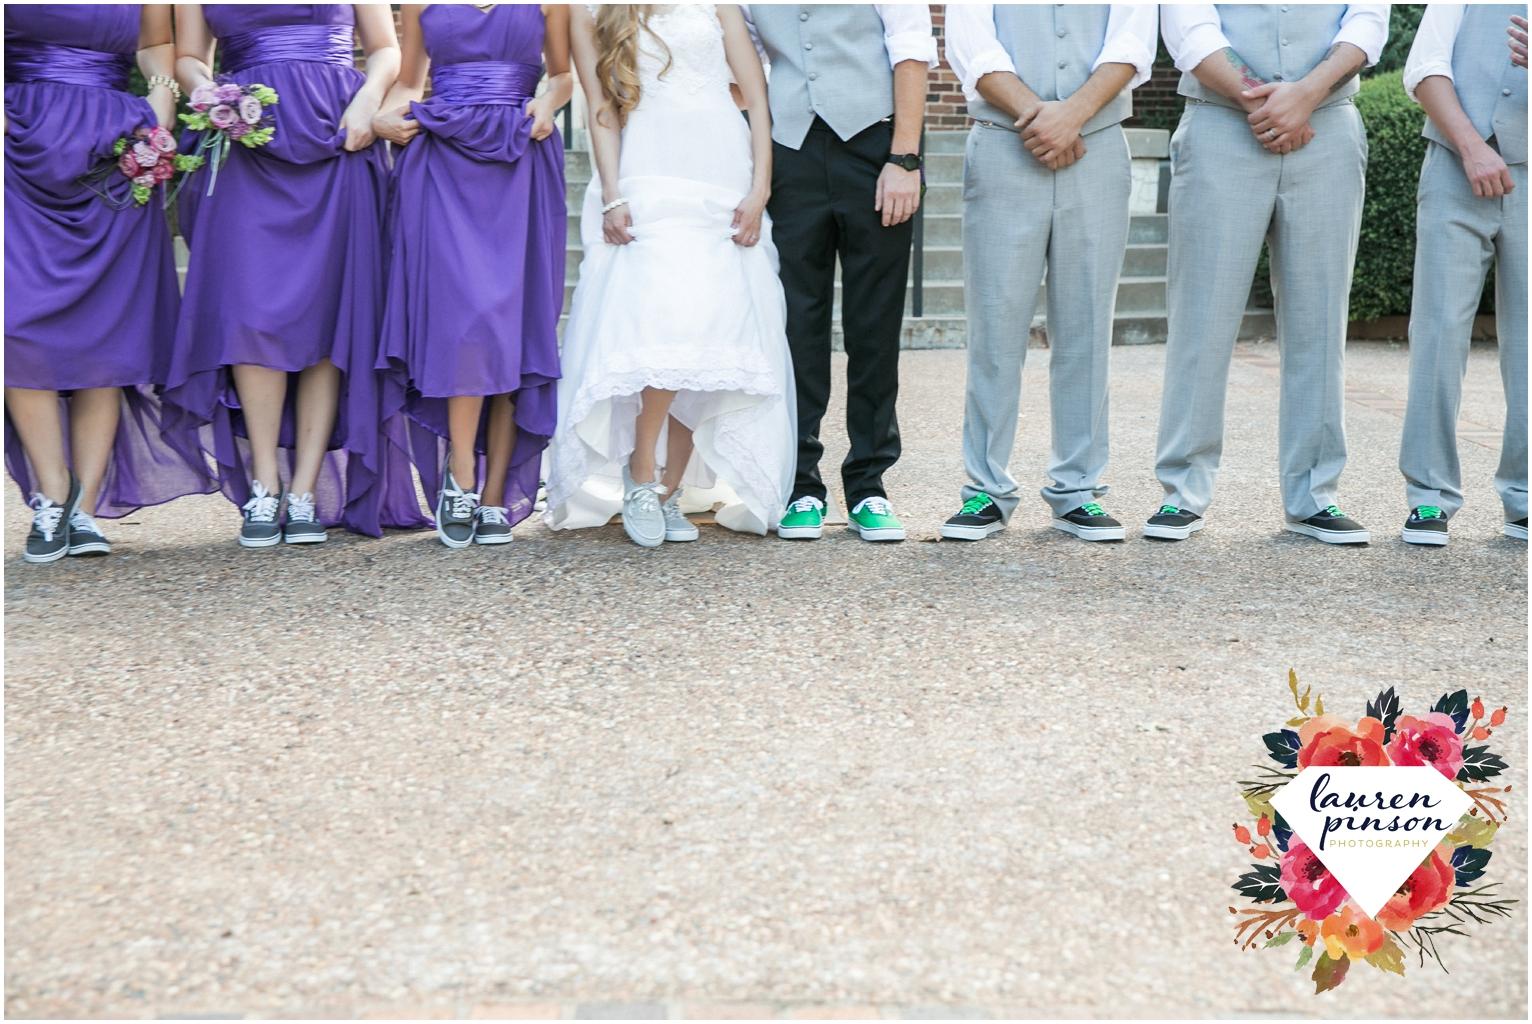 wichita-falls-wedding-photography-at-fain-presbyterian-church-and-the-wellington-timeless-classic-modern-photographer_1240.jpg